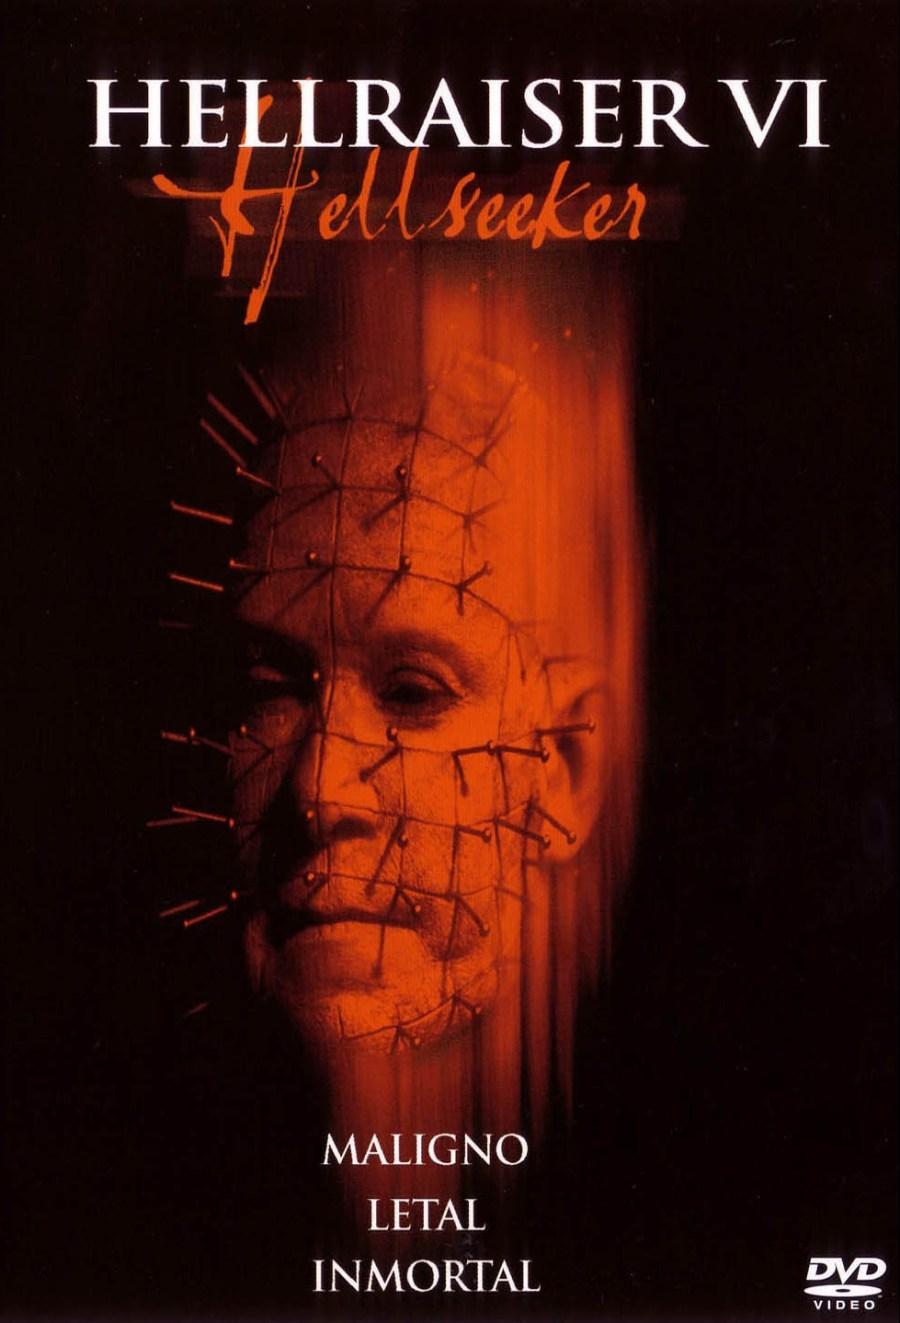 Hellraiser_VI_Hellseeker-Caratula